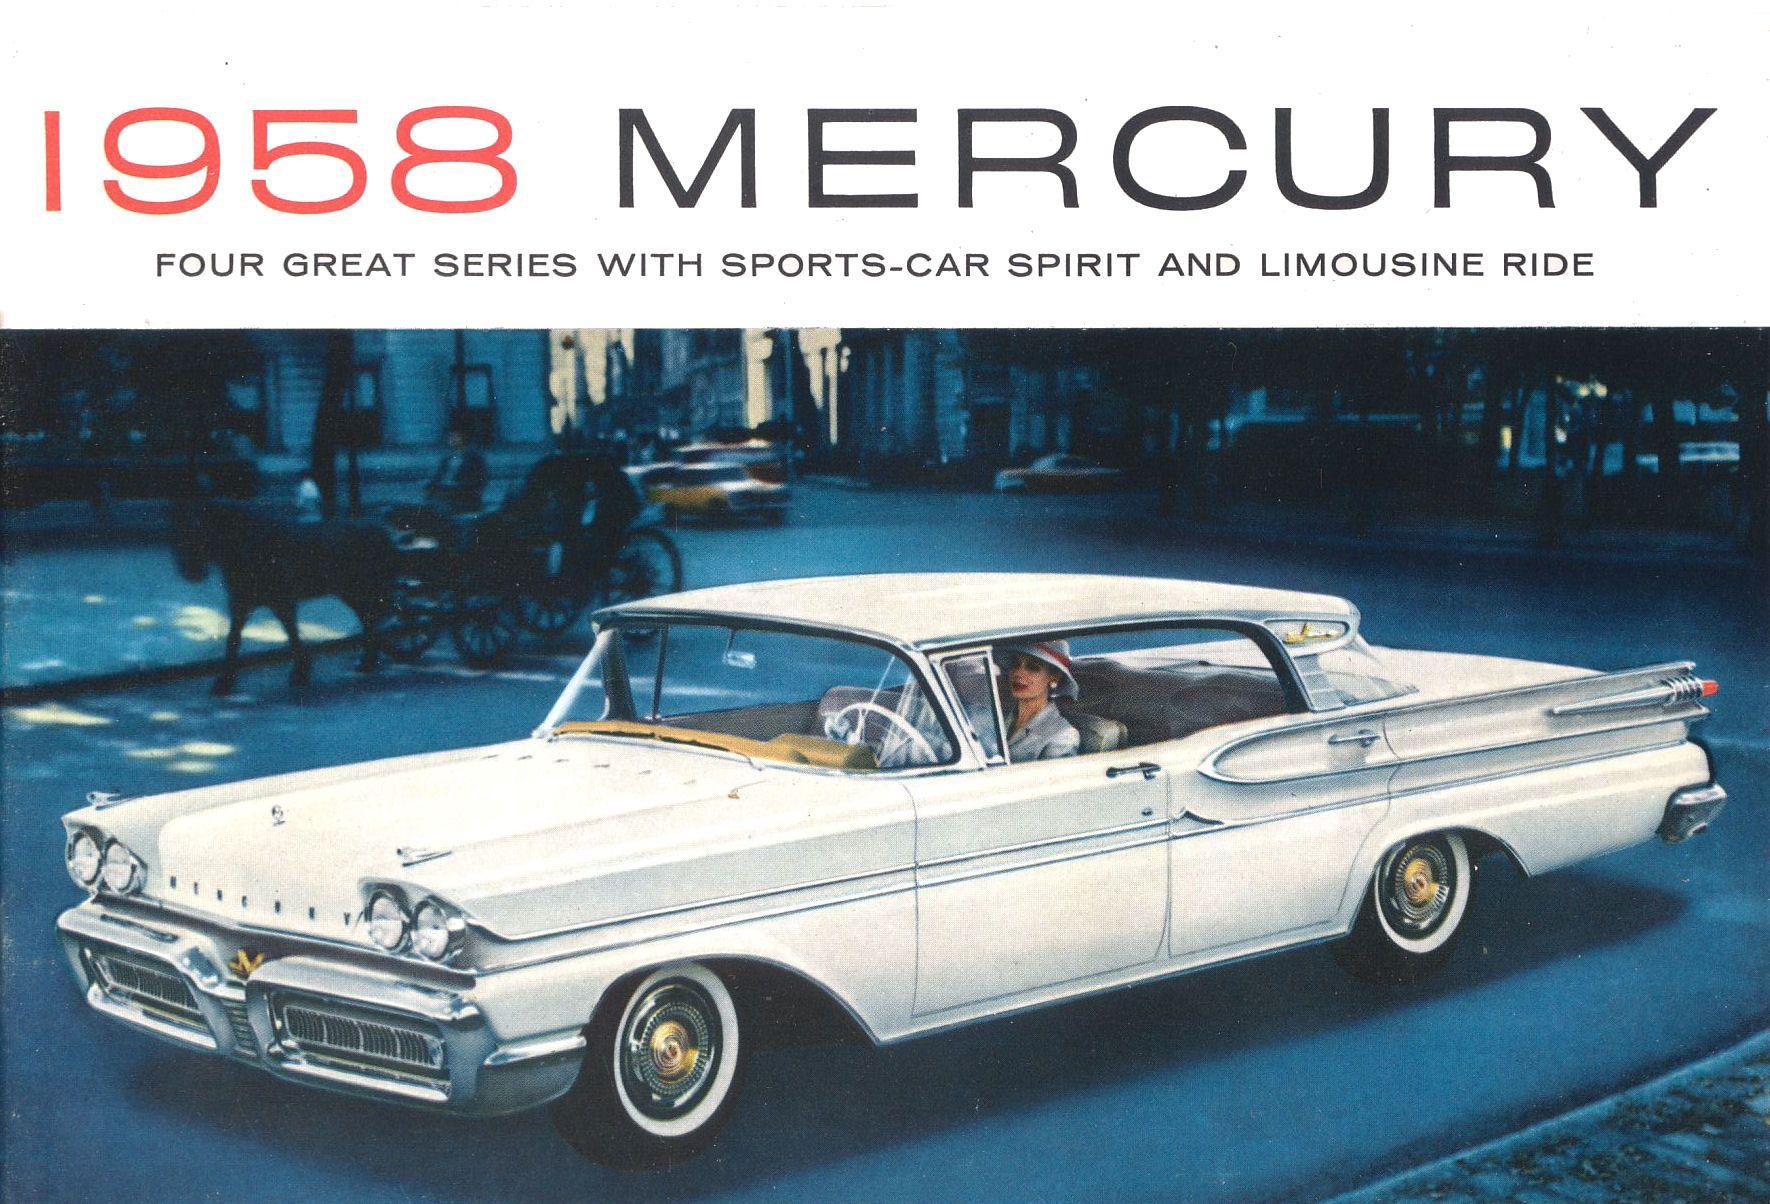 1958 Mercury Brochure-01